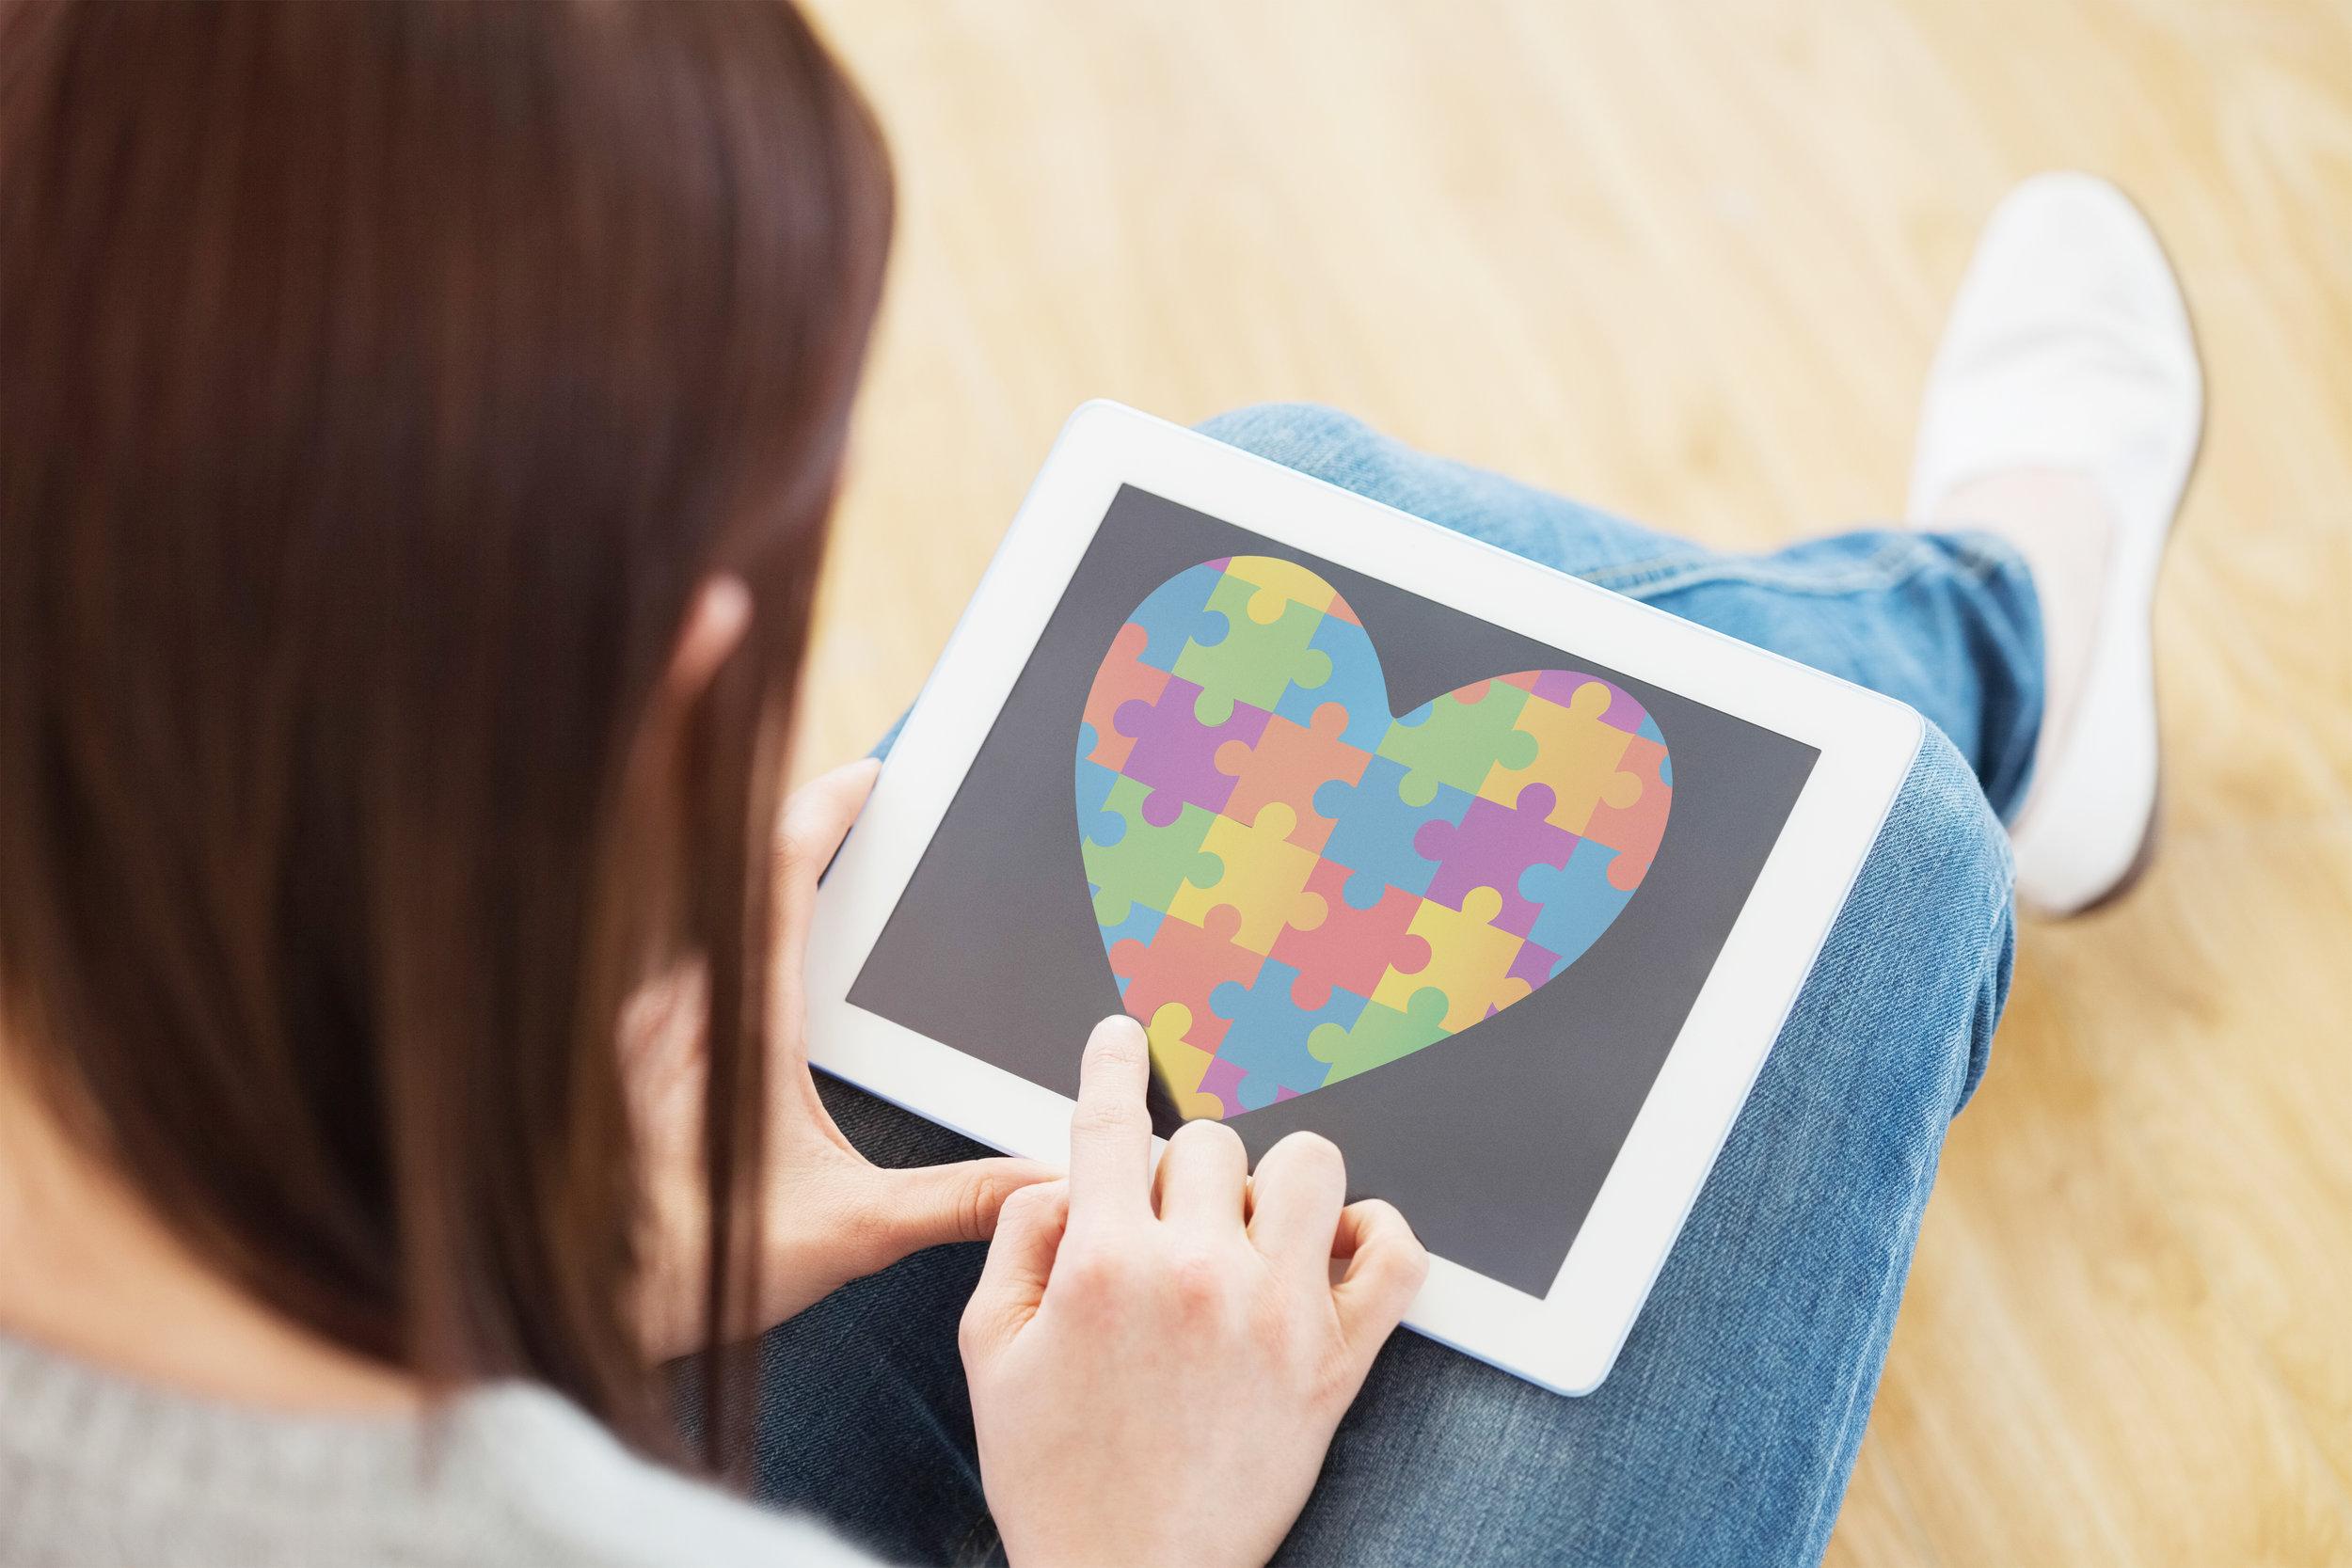 bigstock-Girl-using-a-tablet-pc-sitting-89387945.jpg